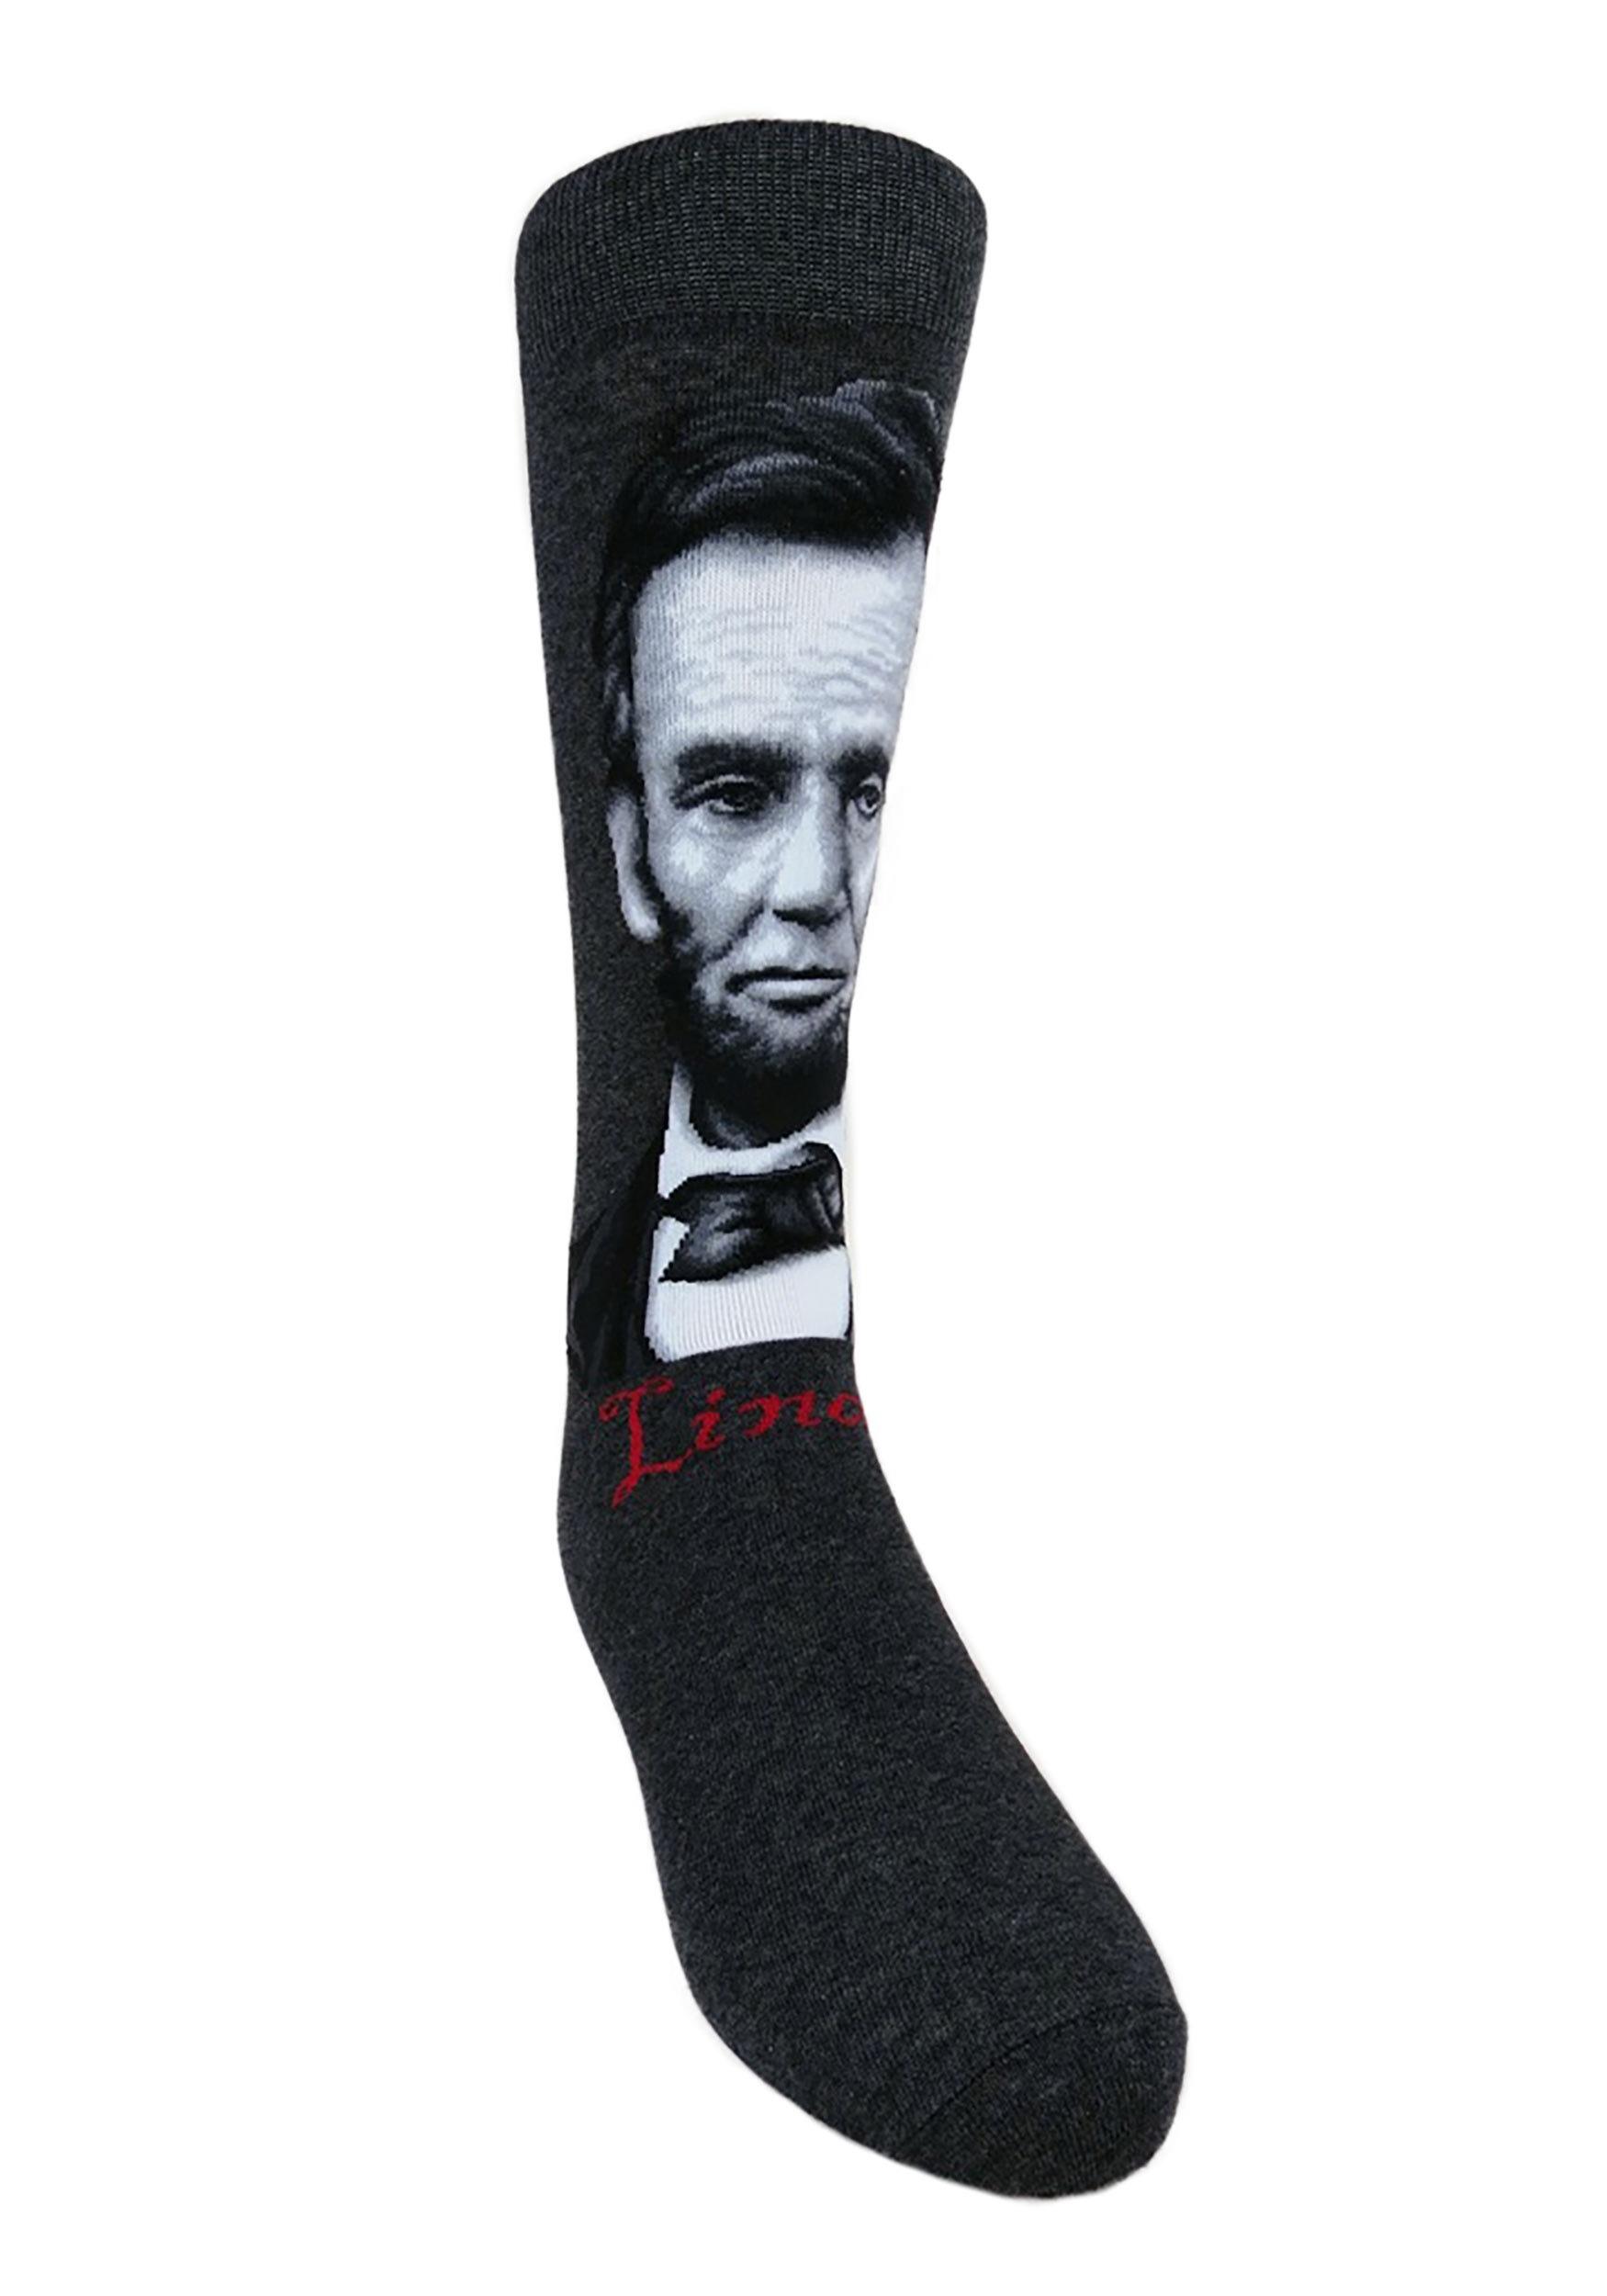 Abe lincoln mens crew socks